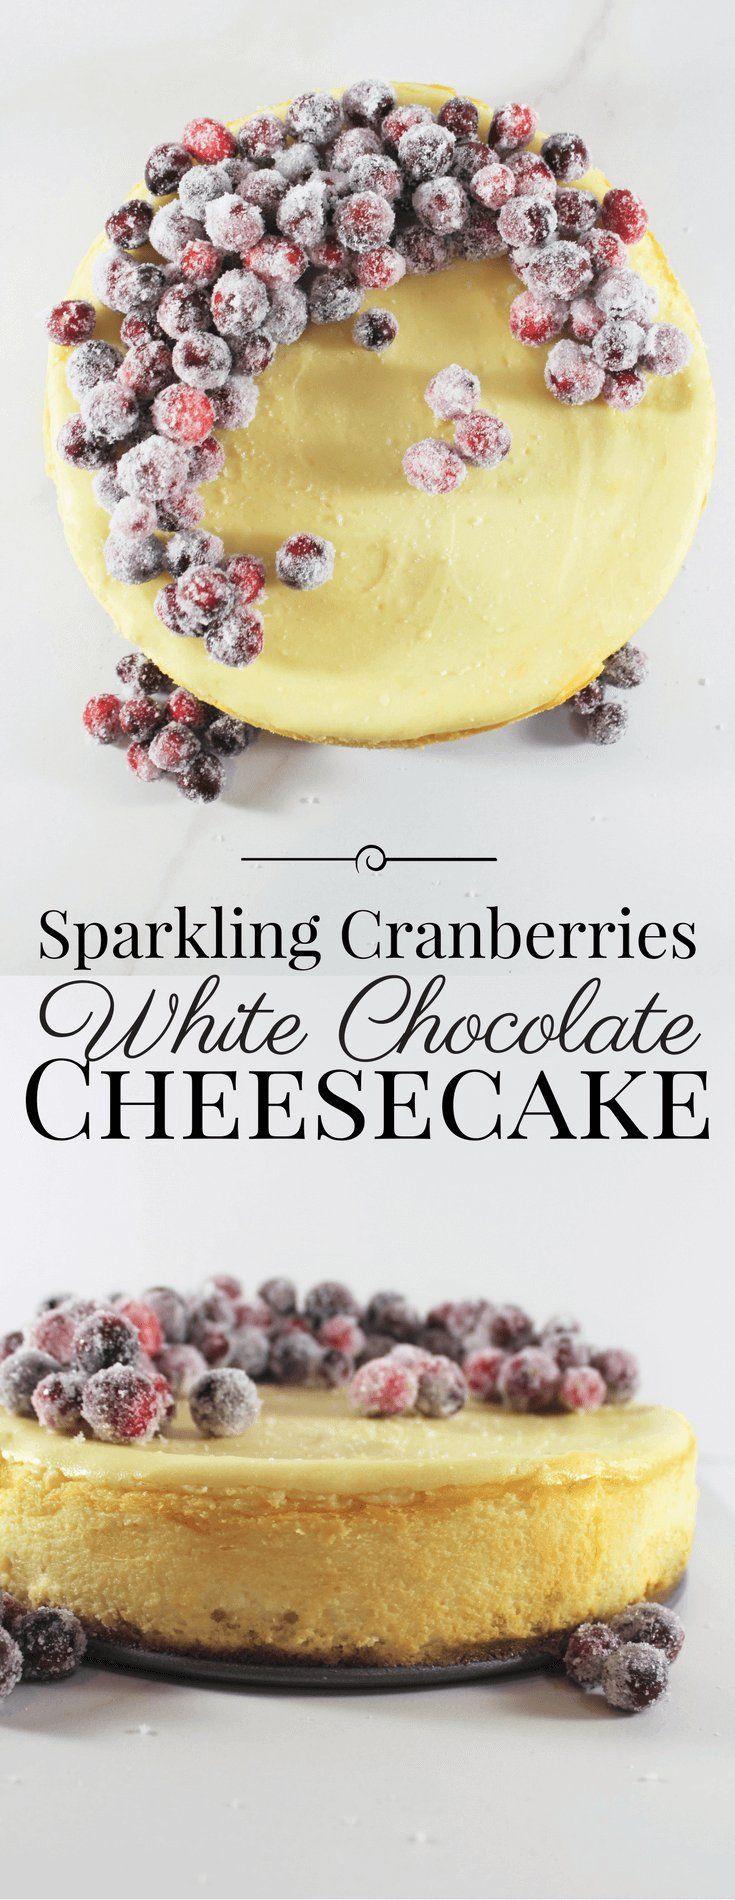 Sparkling Vranberries White Chocolate Cheesecake